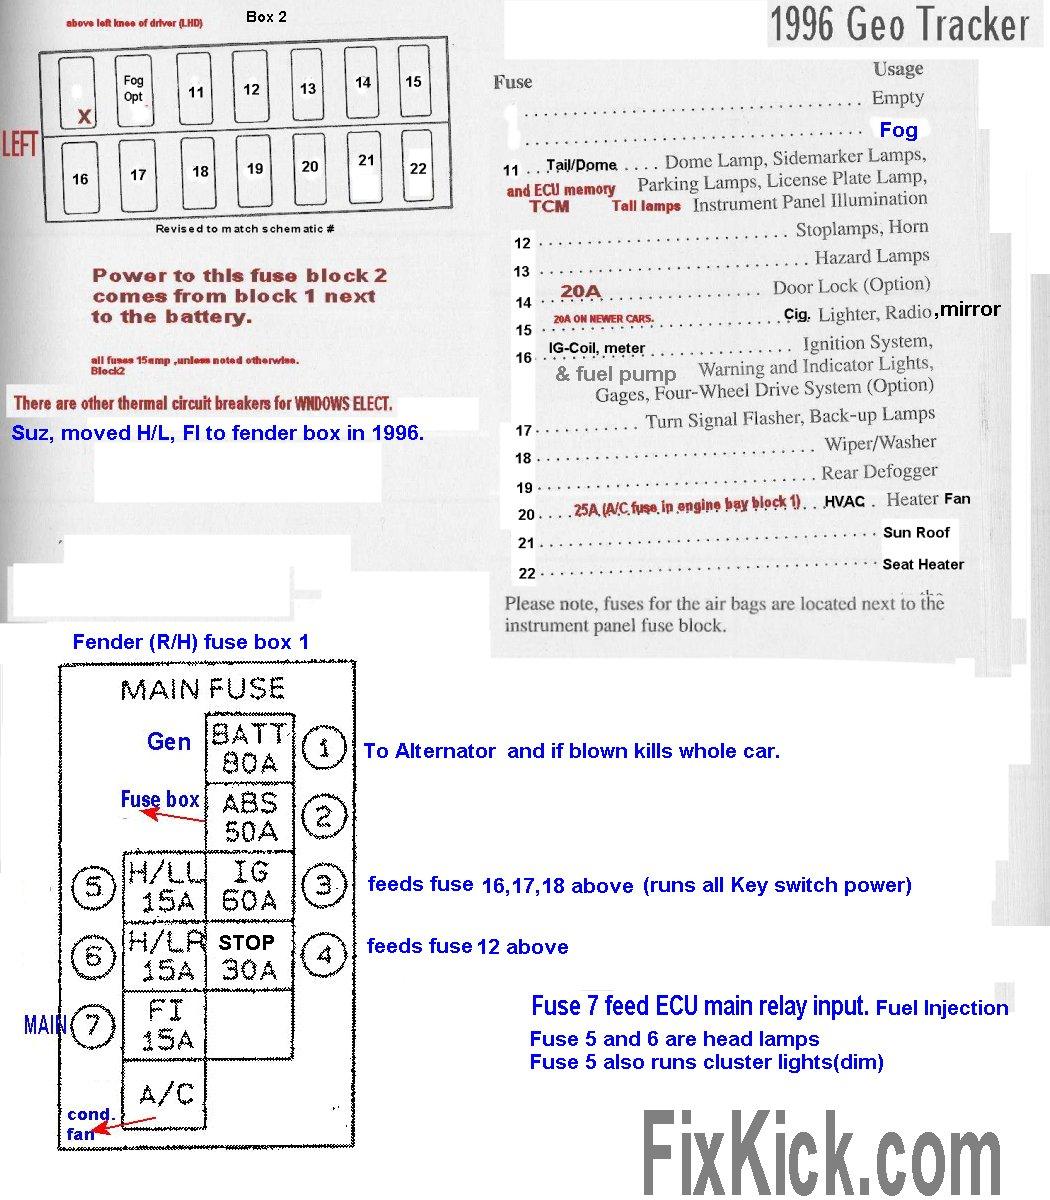 Tracker Fuse Box Diagram Wiring Library 1997 Geo Tracker 1996 Geo Tracker  Fuse Box Location